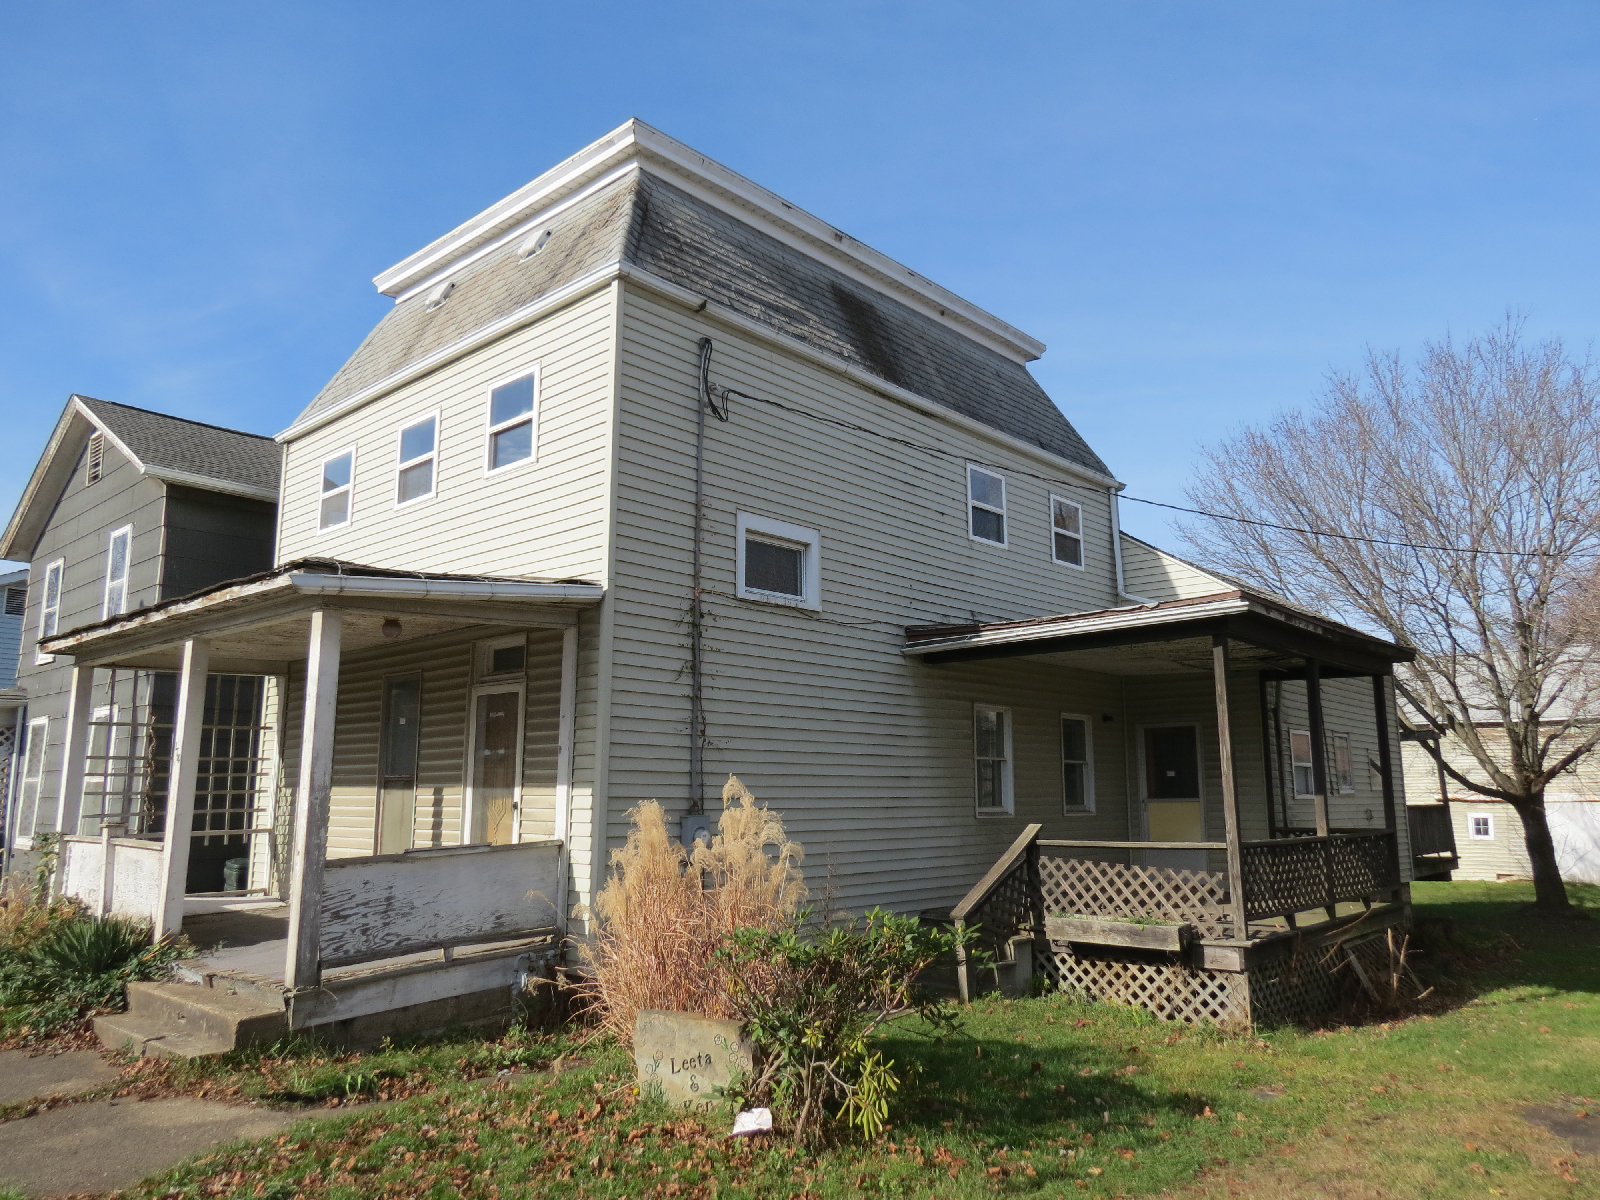 174 W. Adams Street, Cochranton, Pennsylvania 16314